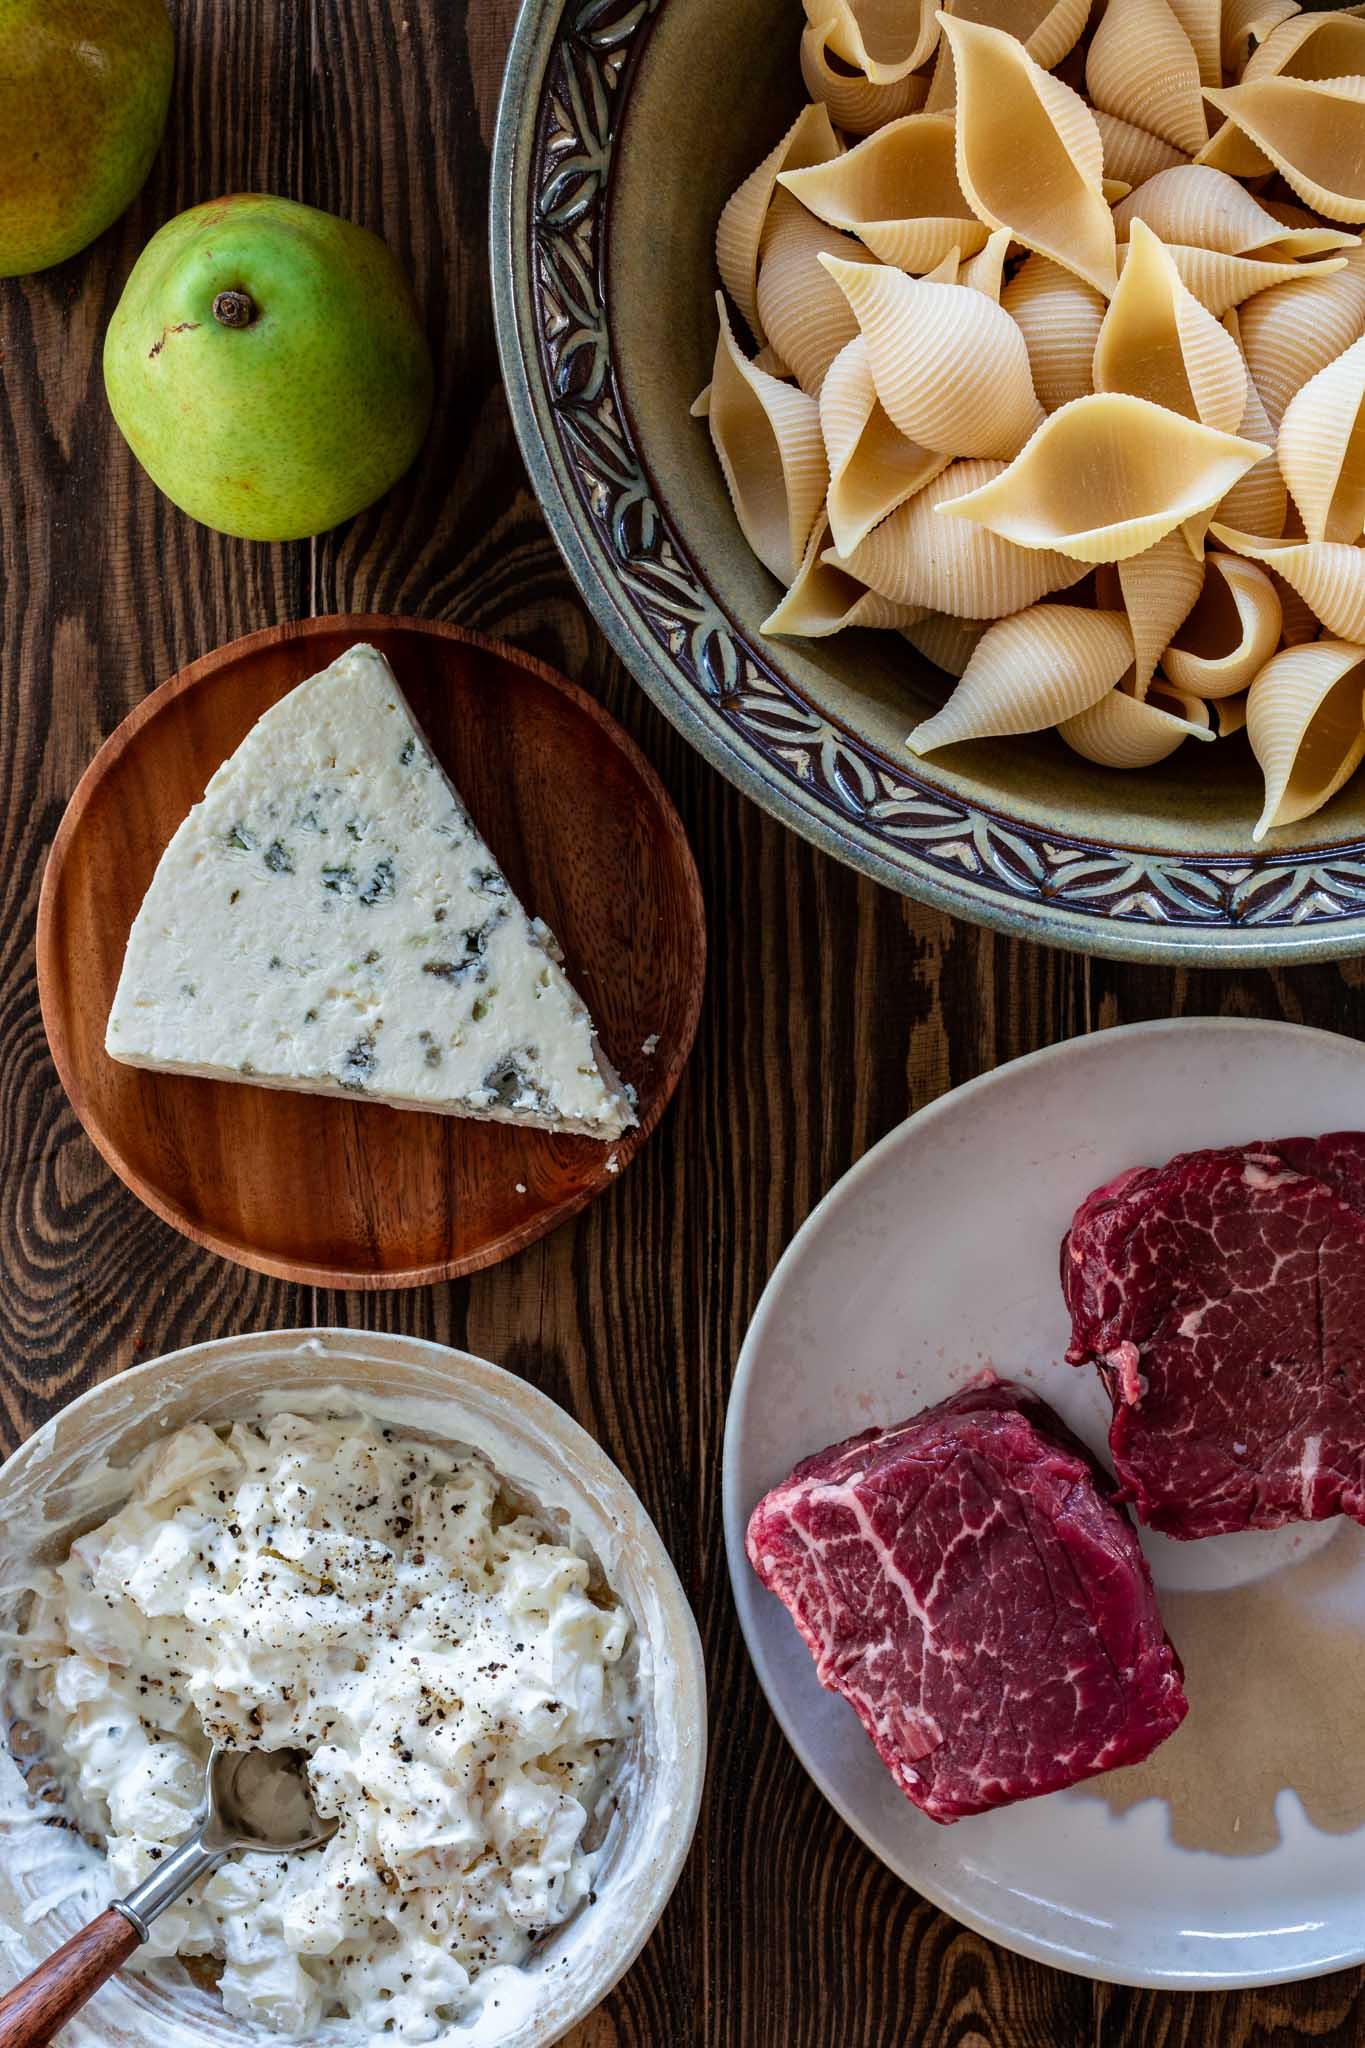 Ingredients to make Pan Seared filet mignon with conchiglioni gratin.